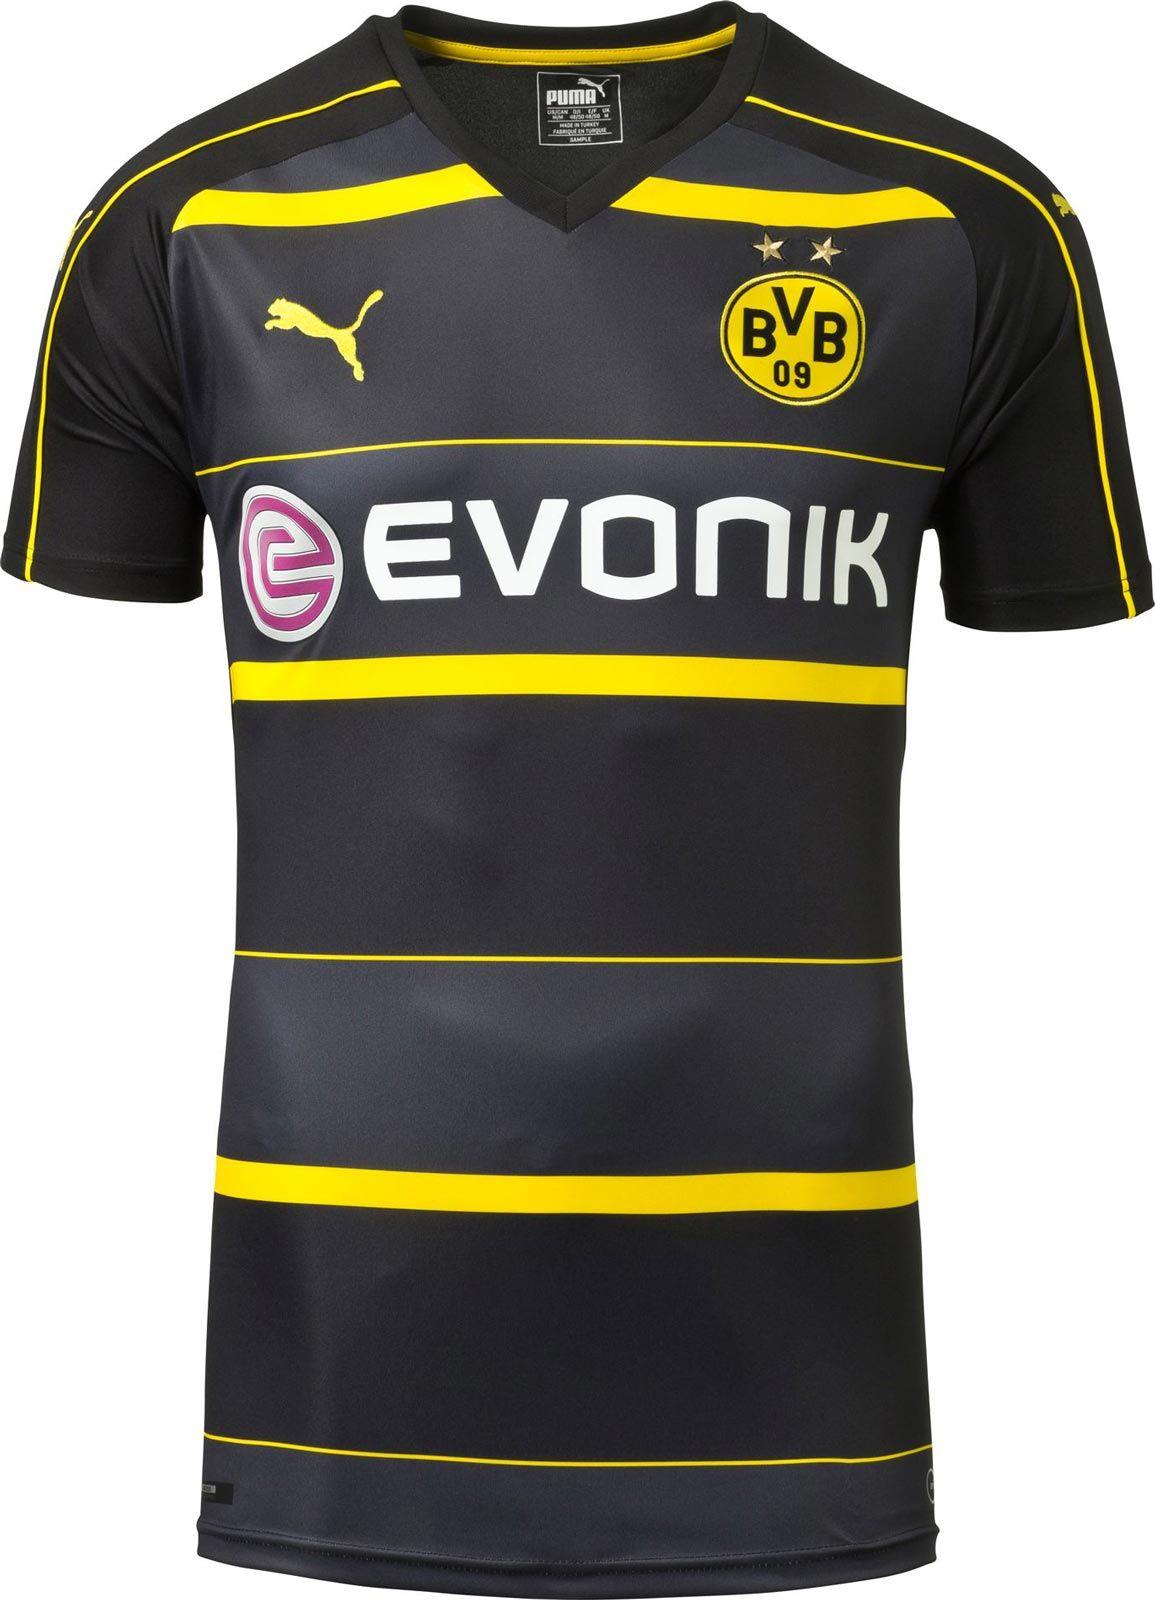 The new Borussia Dortmund 2016-2017 Away Kit boasts a very interesting  design.